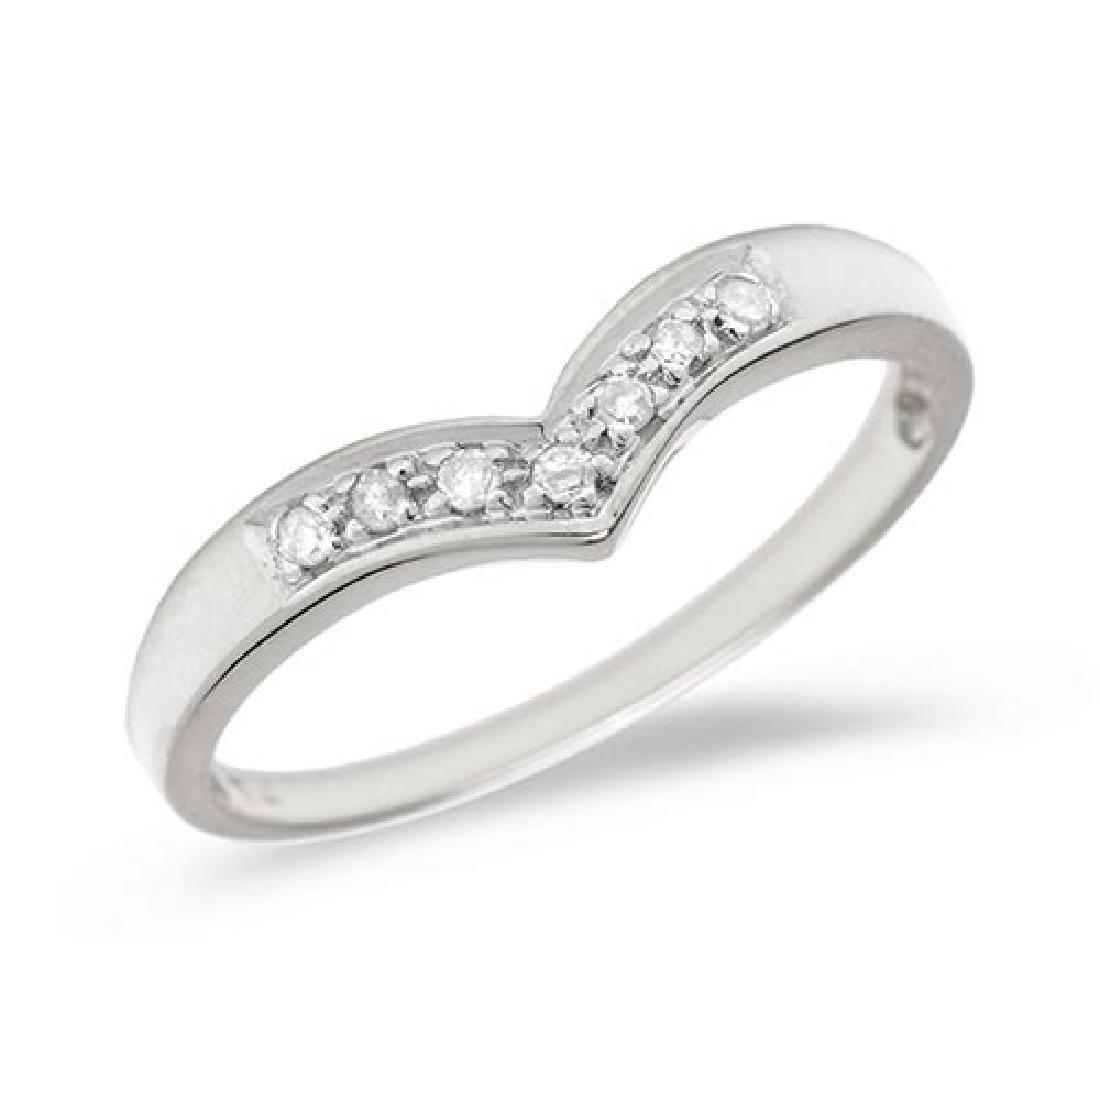 Certified 10K White Gold Diamond Chevron Ring 0.07 CTW